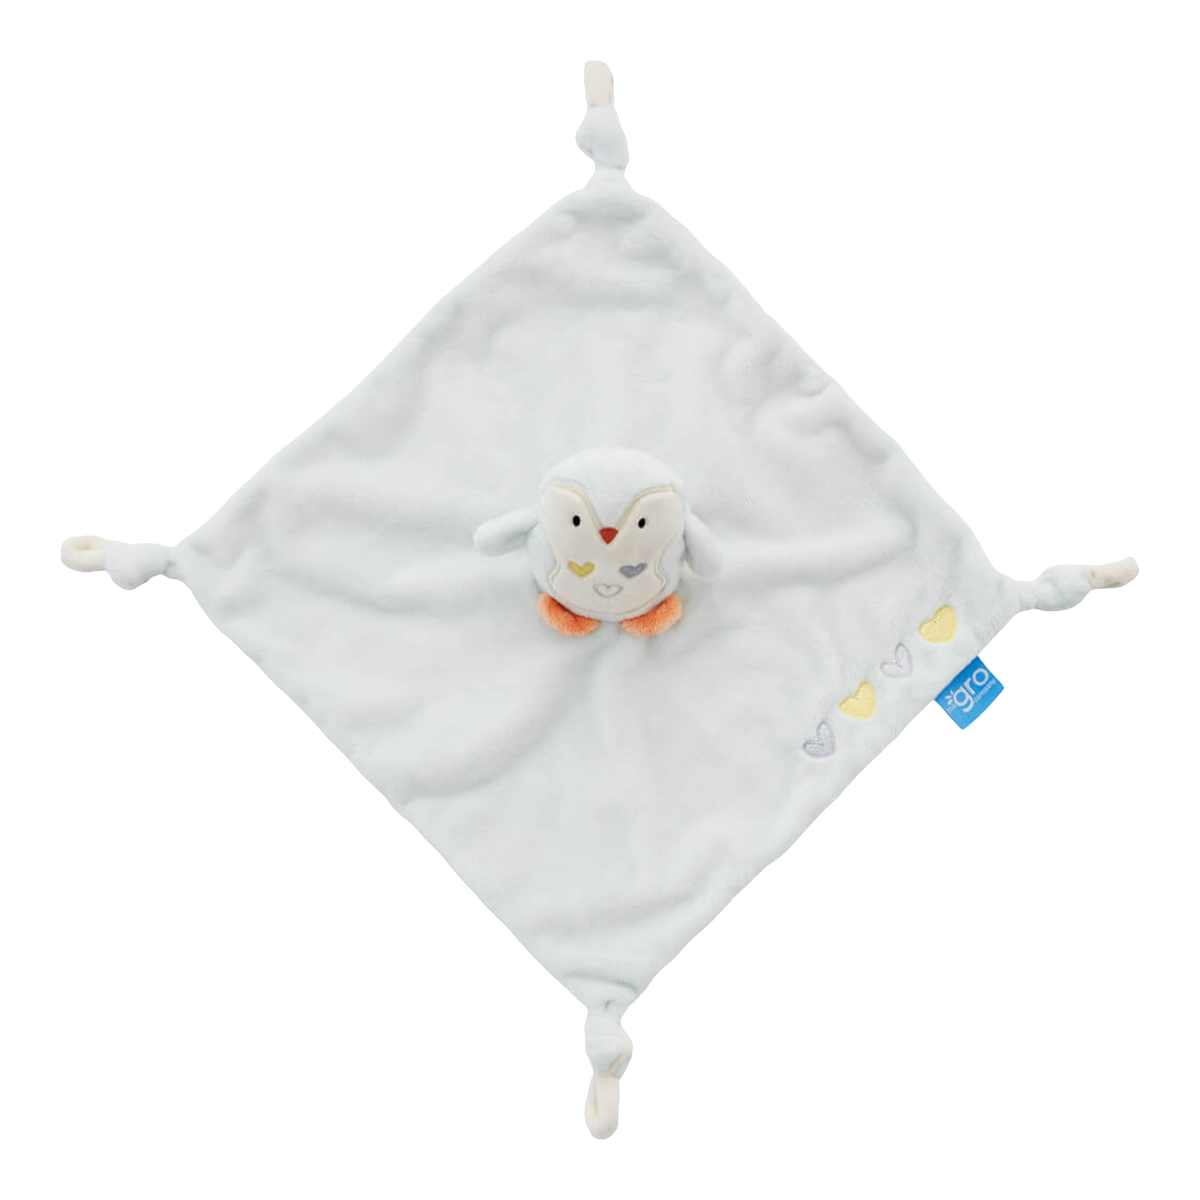 percy-the-penguin-soft-gro-comforter